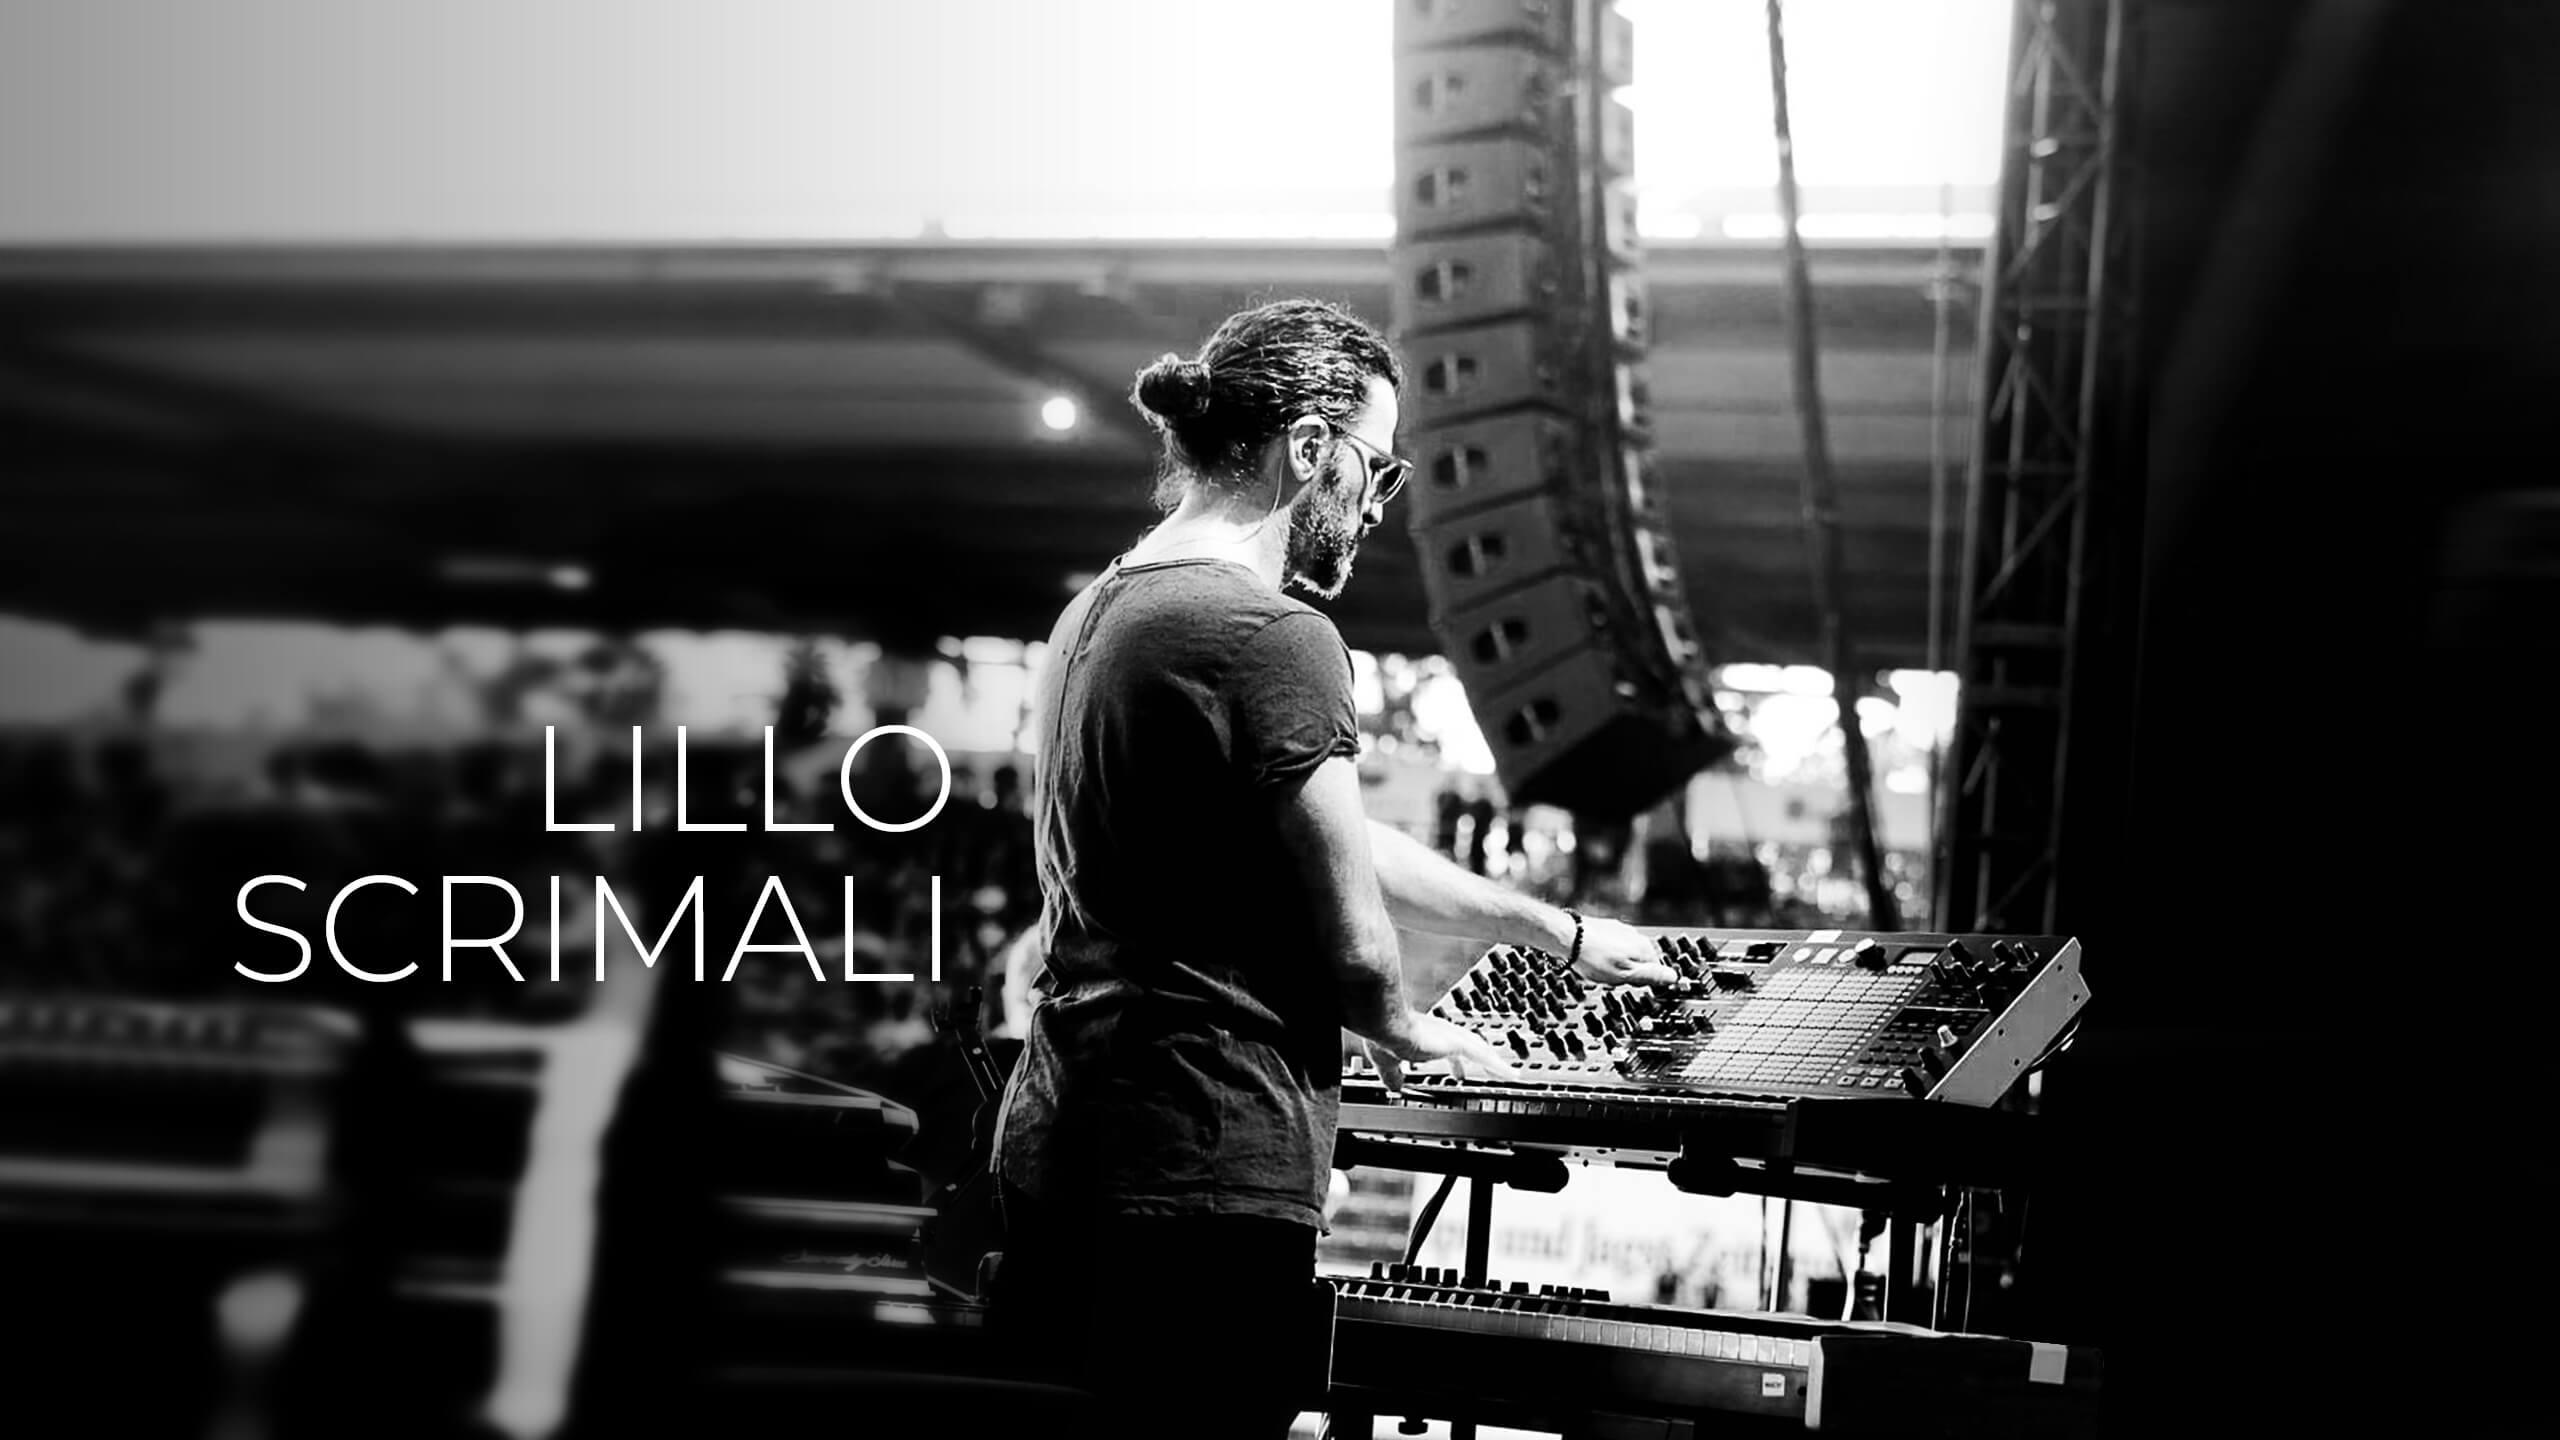 Lillo Scrimali am Keyboard